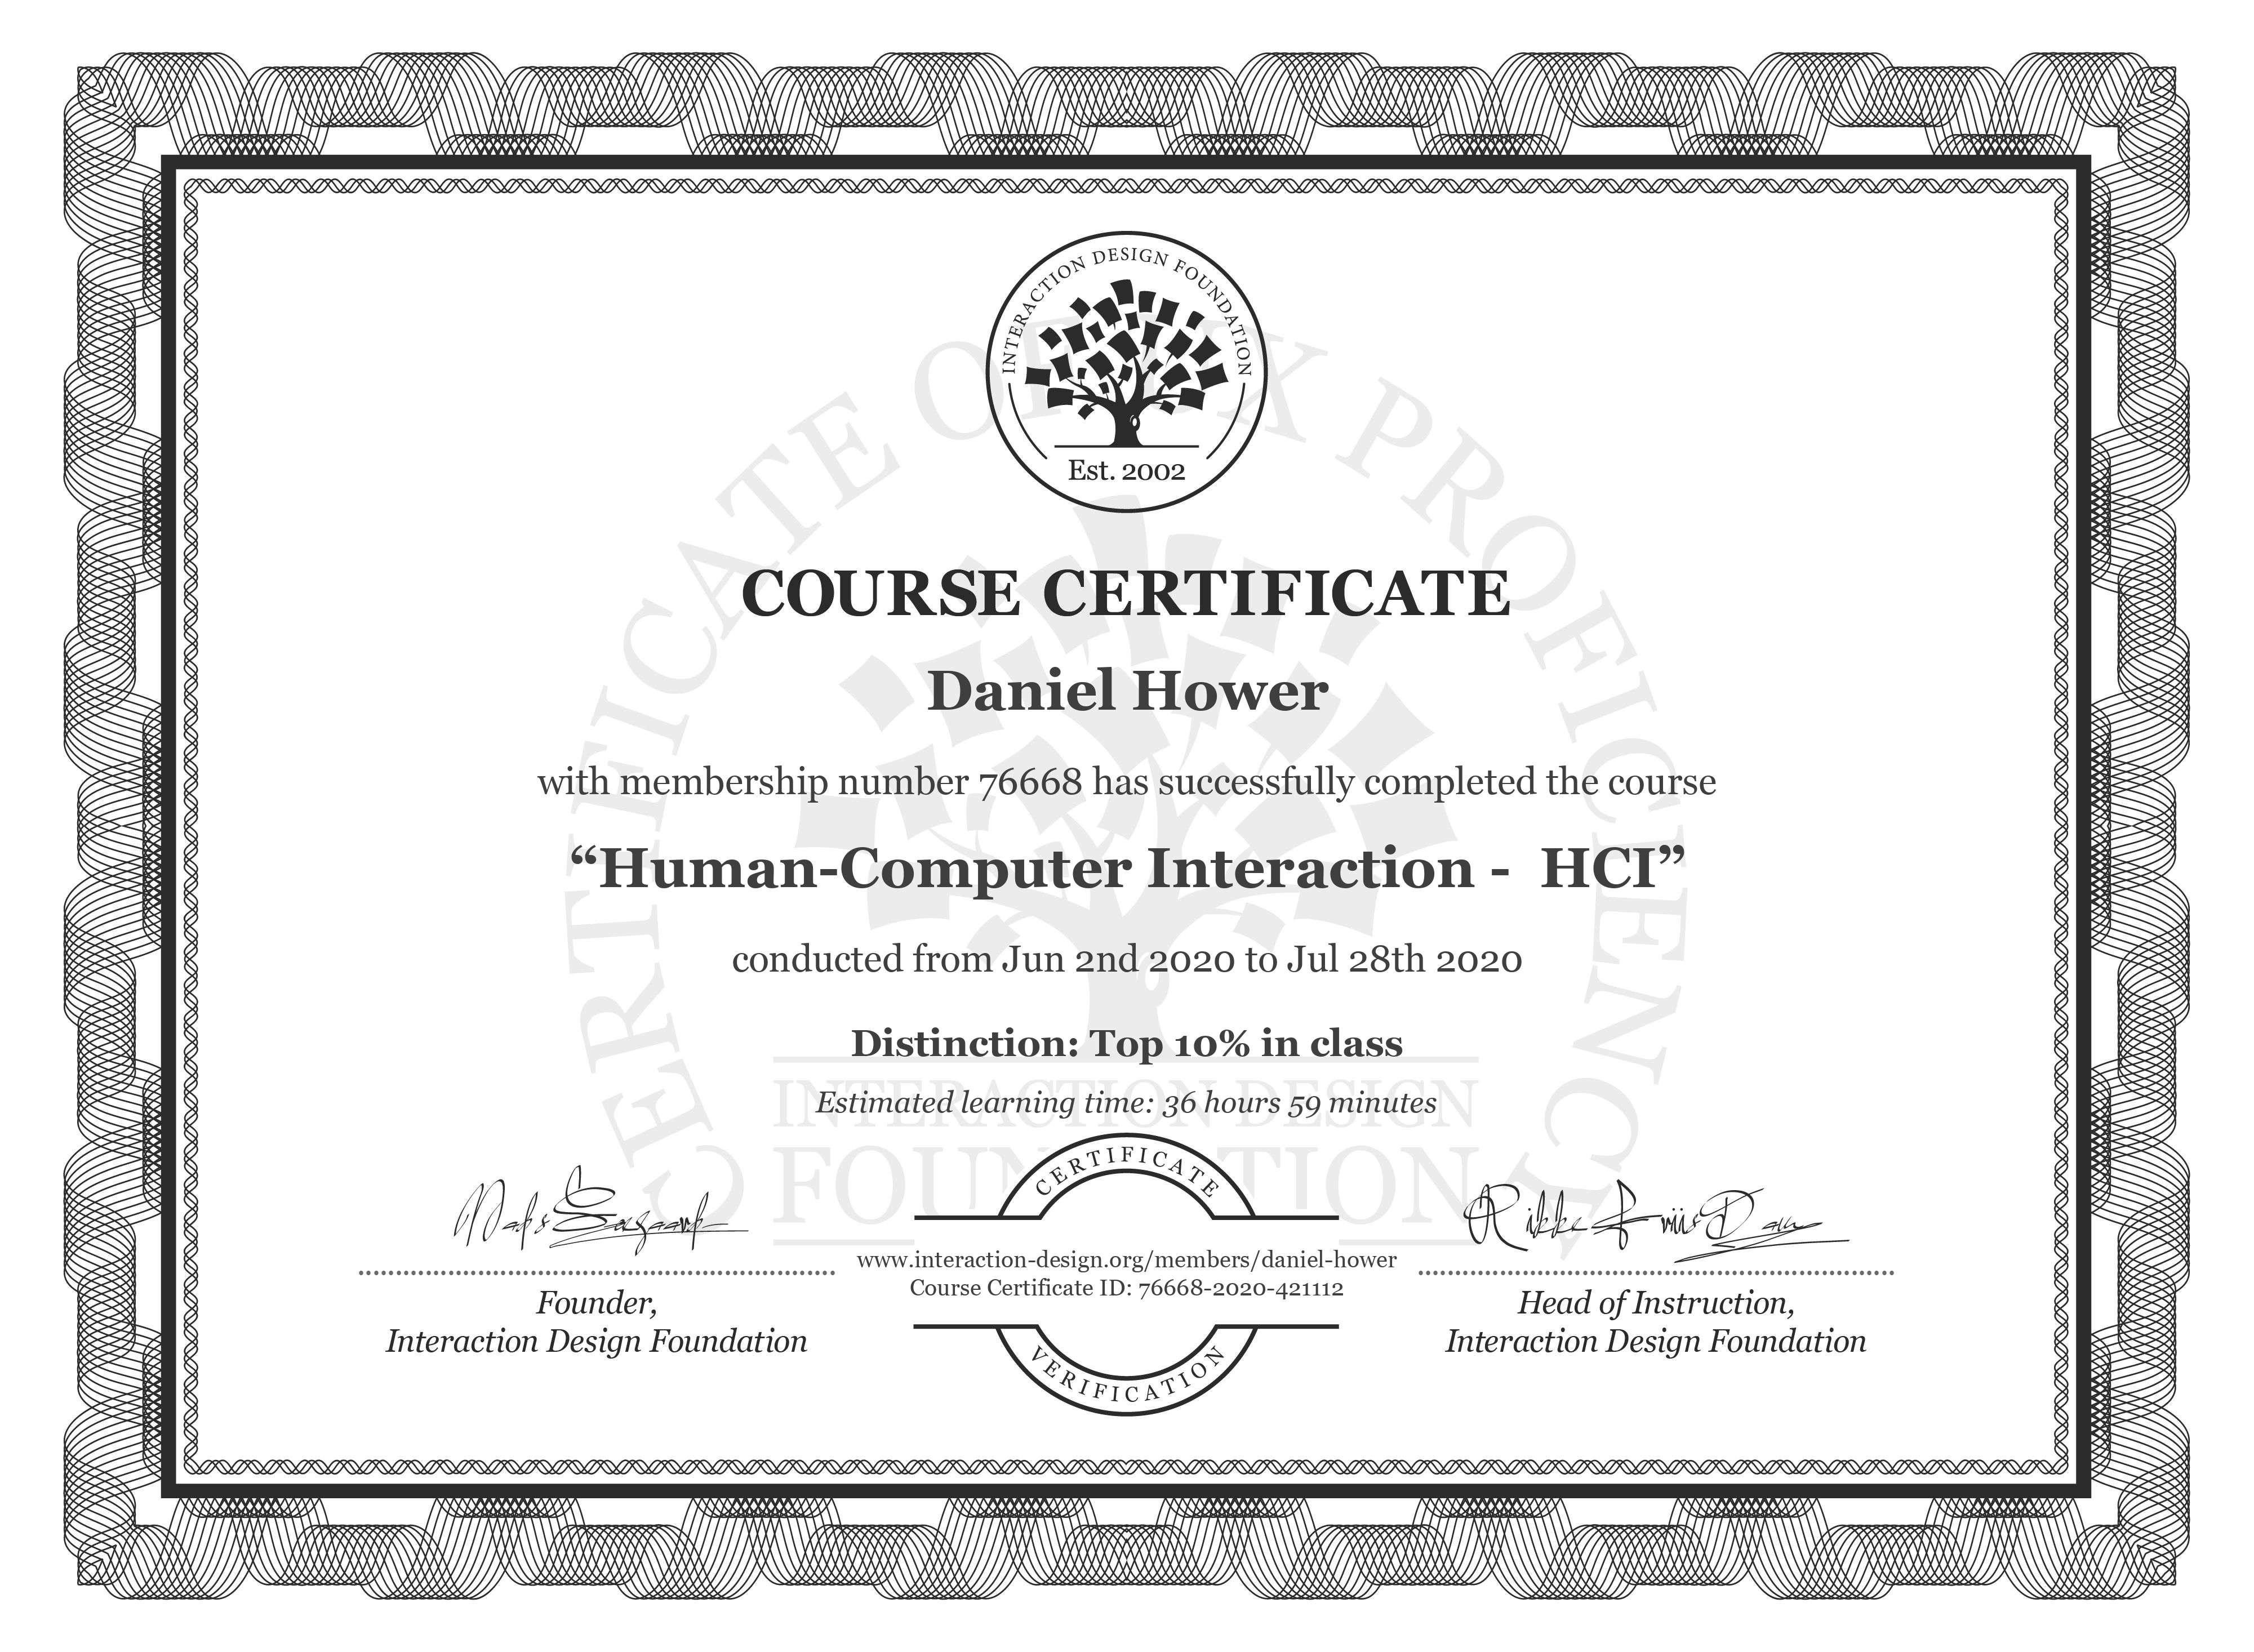 Daniel Hower's Course Certificate: Human-Computer Interaction -  HCI